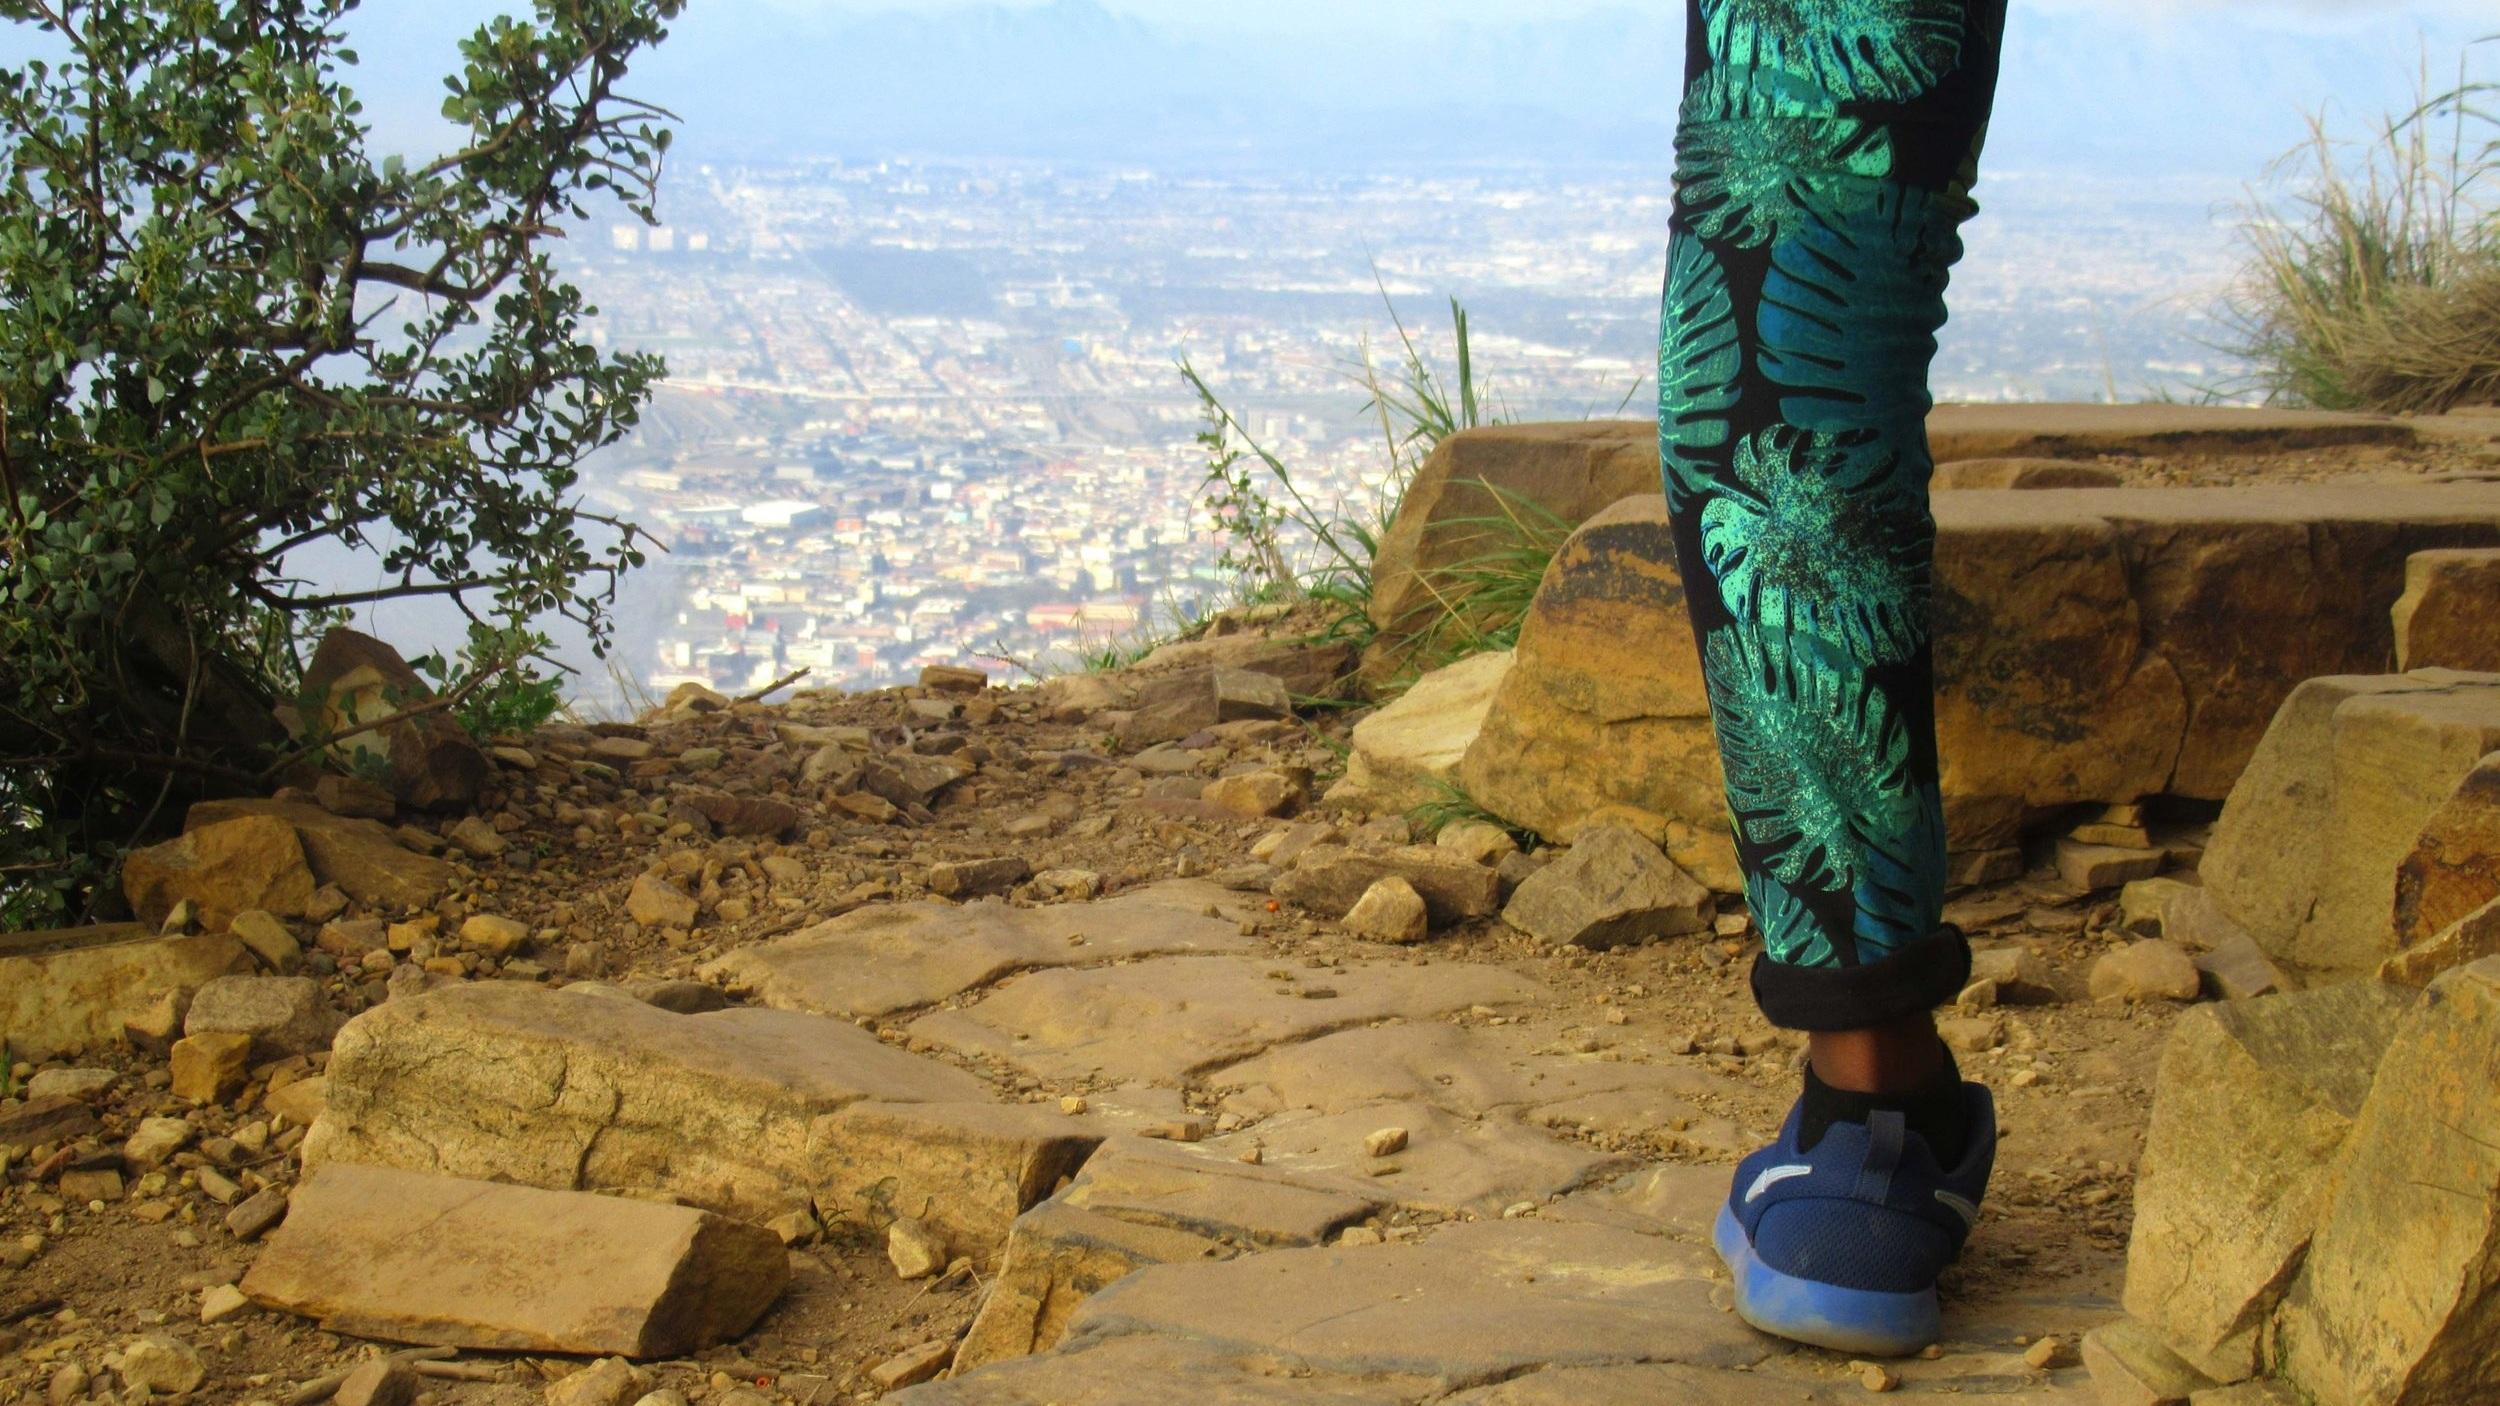 cape_town_hike_lions_head_city_view_blog.jpg